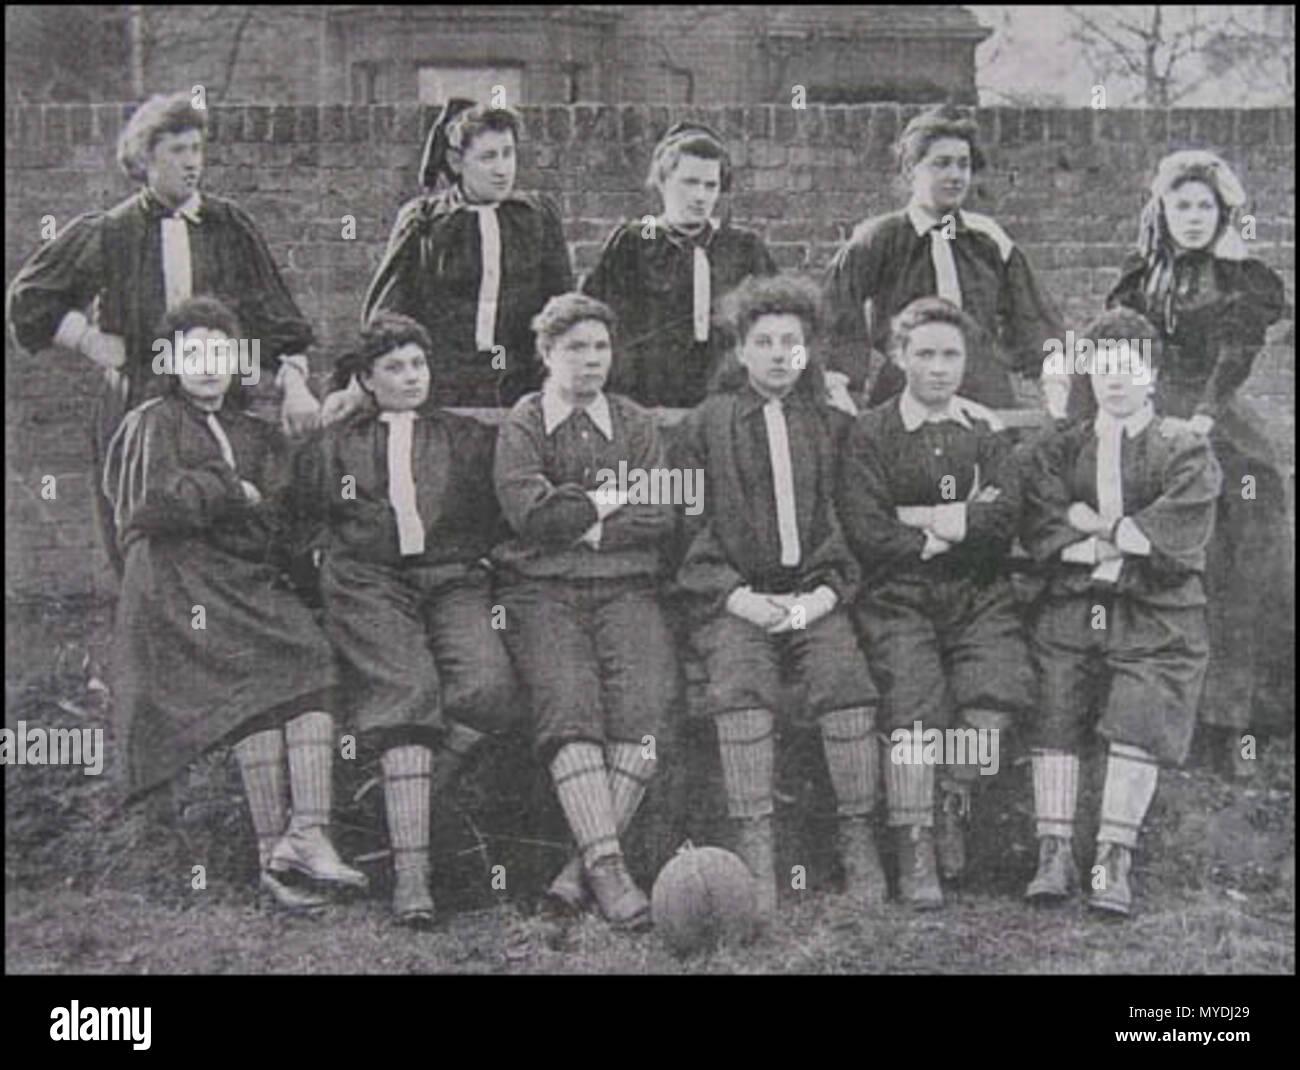 . L'équipe de North London, le 23 mars 1895. Debout: Lily Lynn, Nettie Honeyball, Williams, Edwards, Ide. Assises: Compton, F. B. Fenn, Nellie Gilbert, P. Smith, Rosa Thiere, Biggs. 1895. Unknown 87 British Ladies Football Club - Stock Image